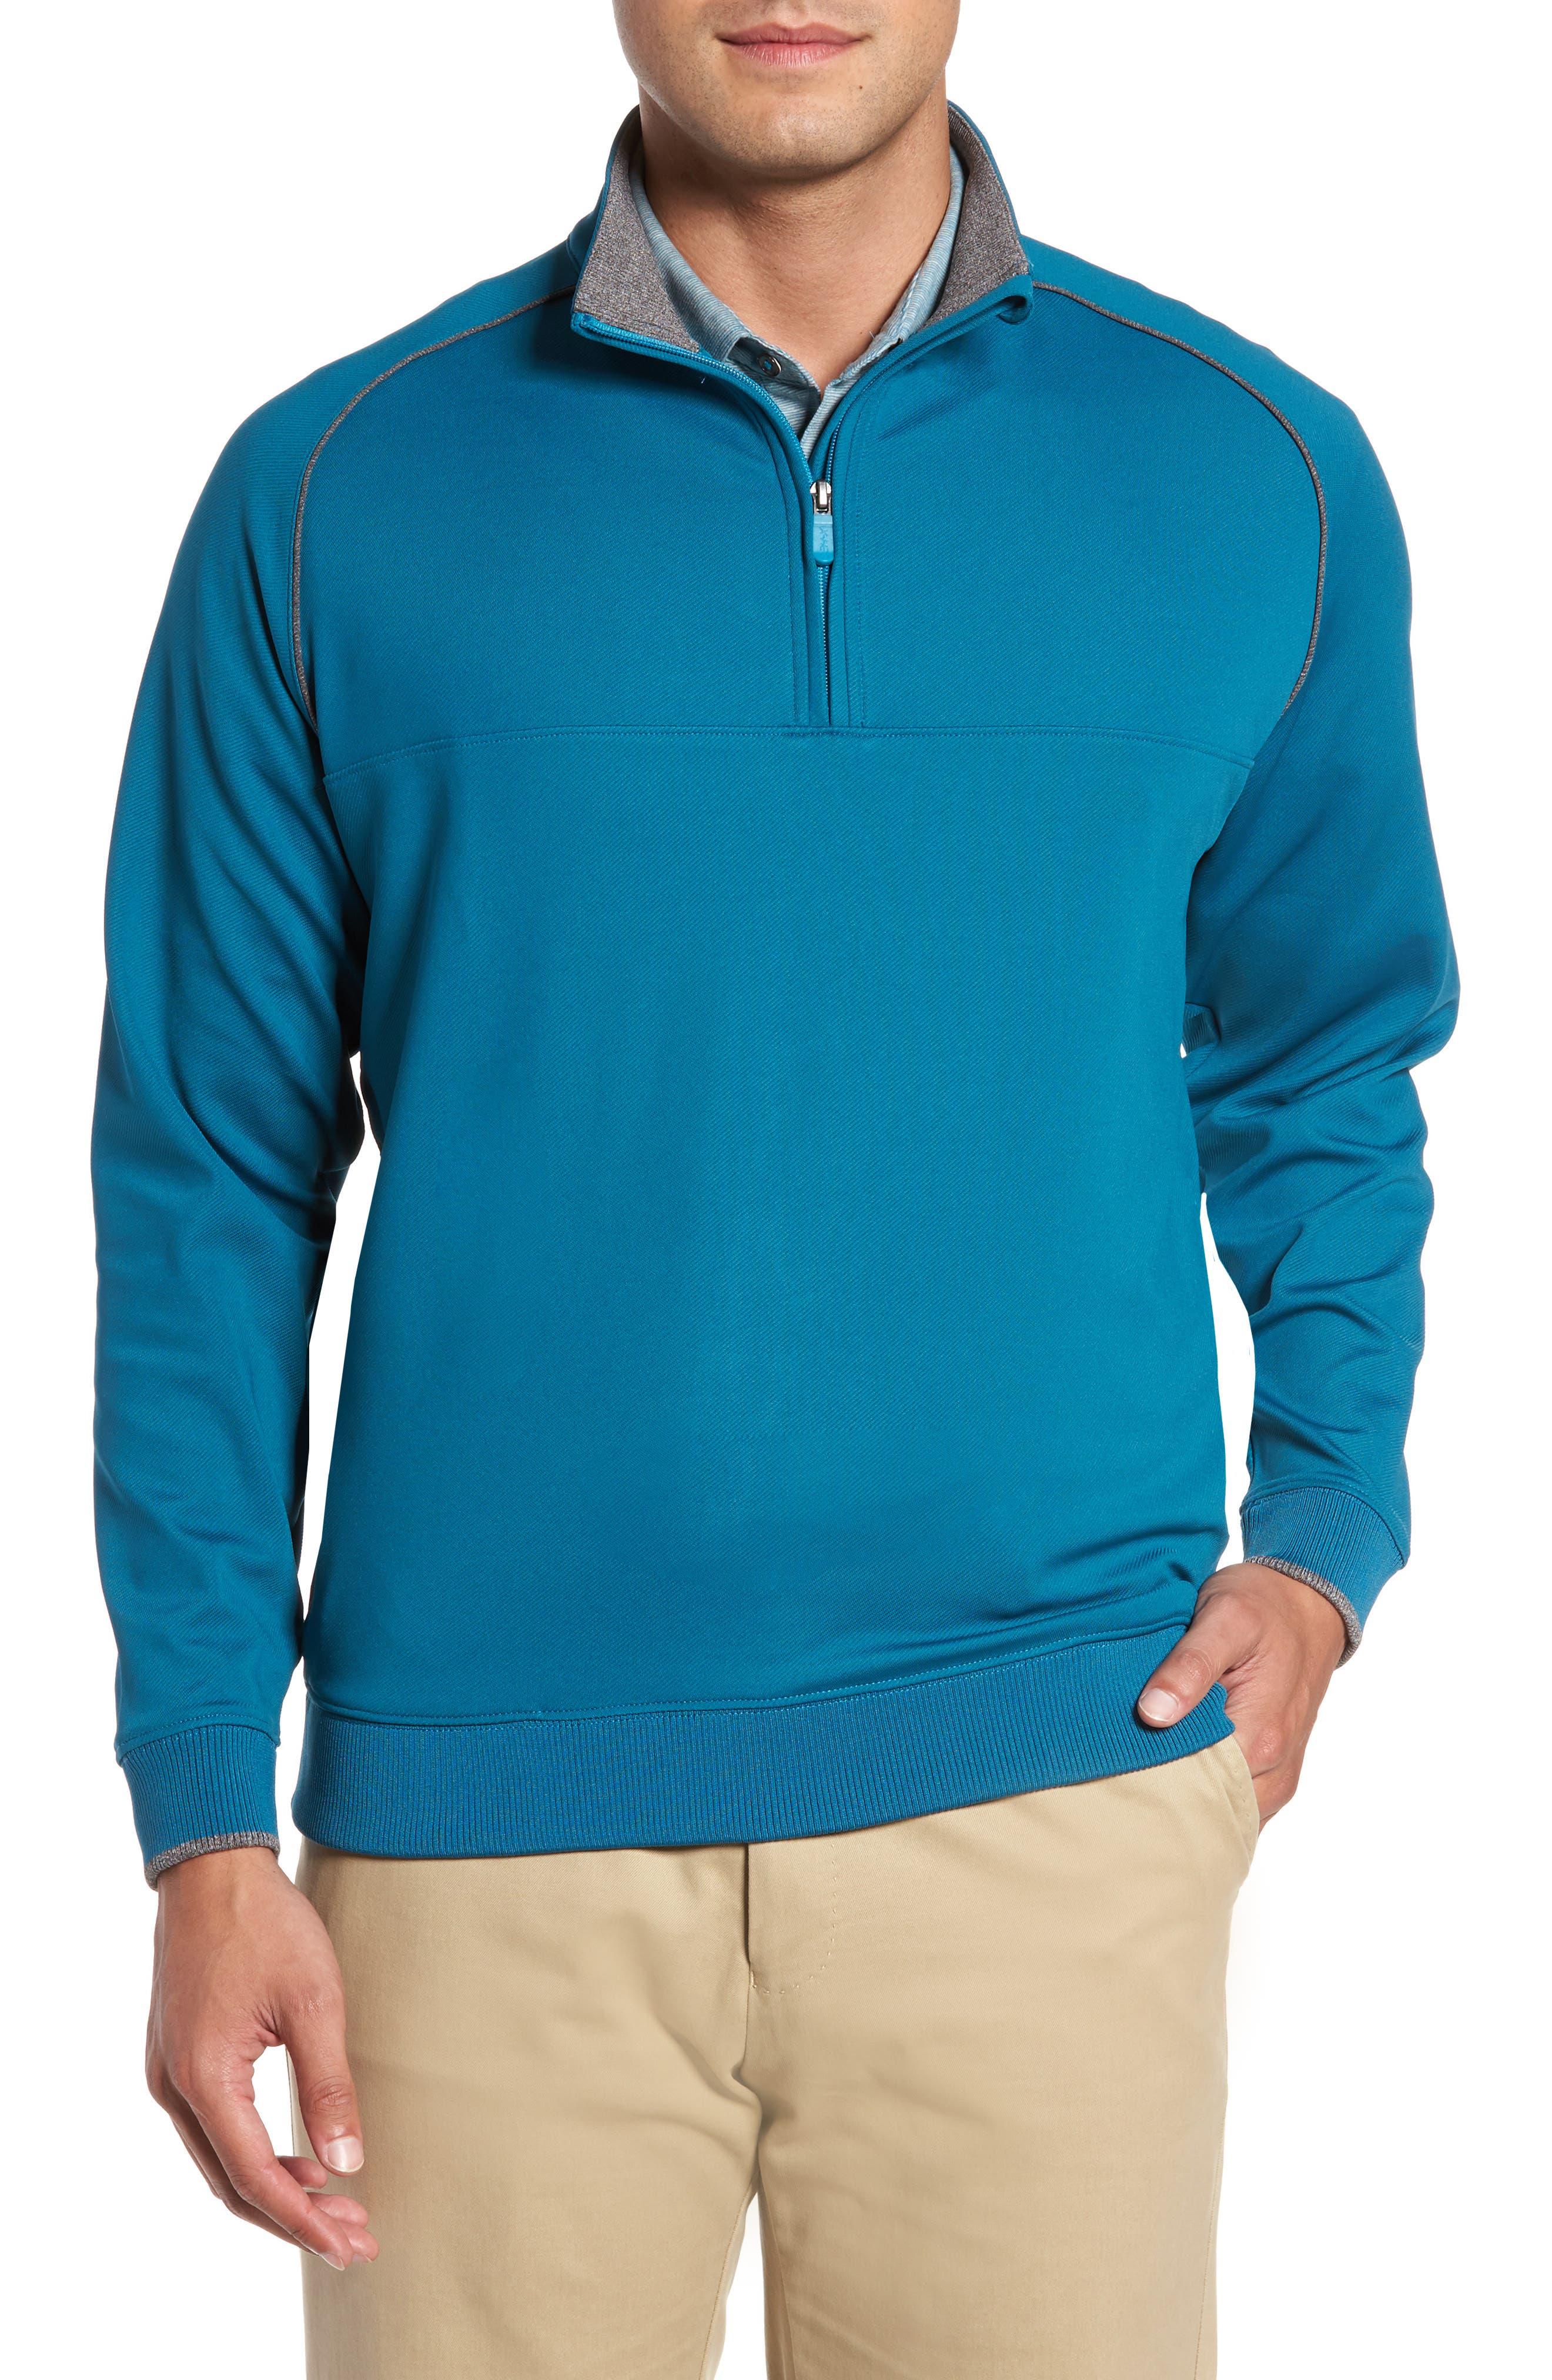 Main Image - Bobby Jones XH20 Banded Bottom Pullover